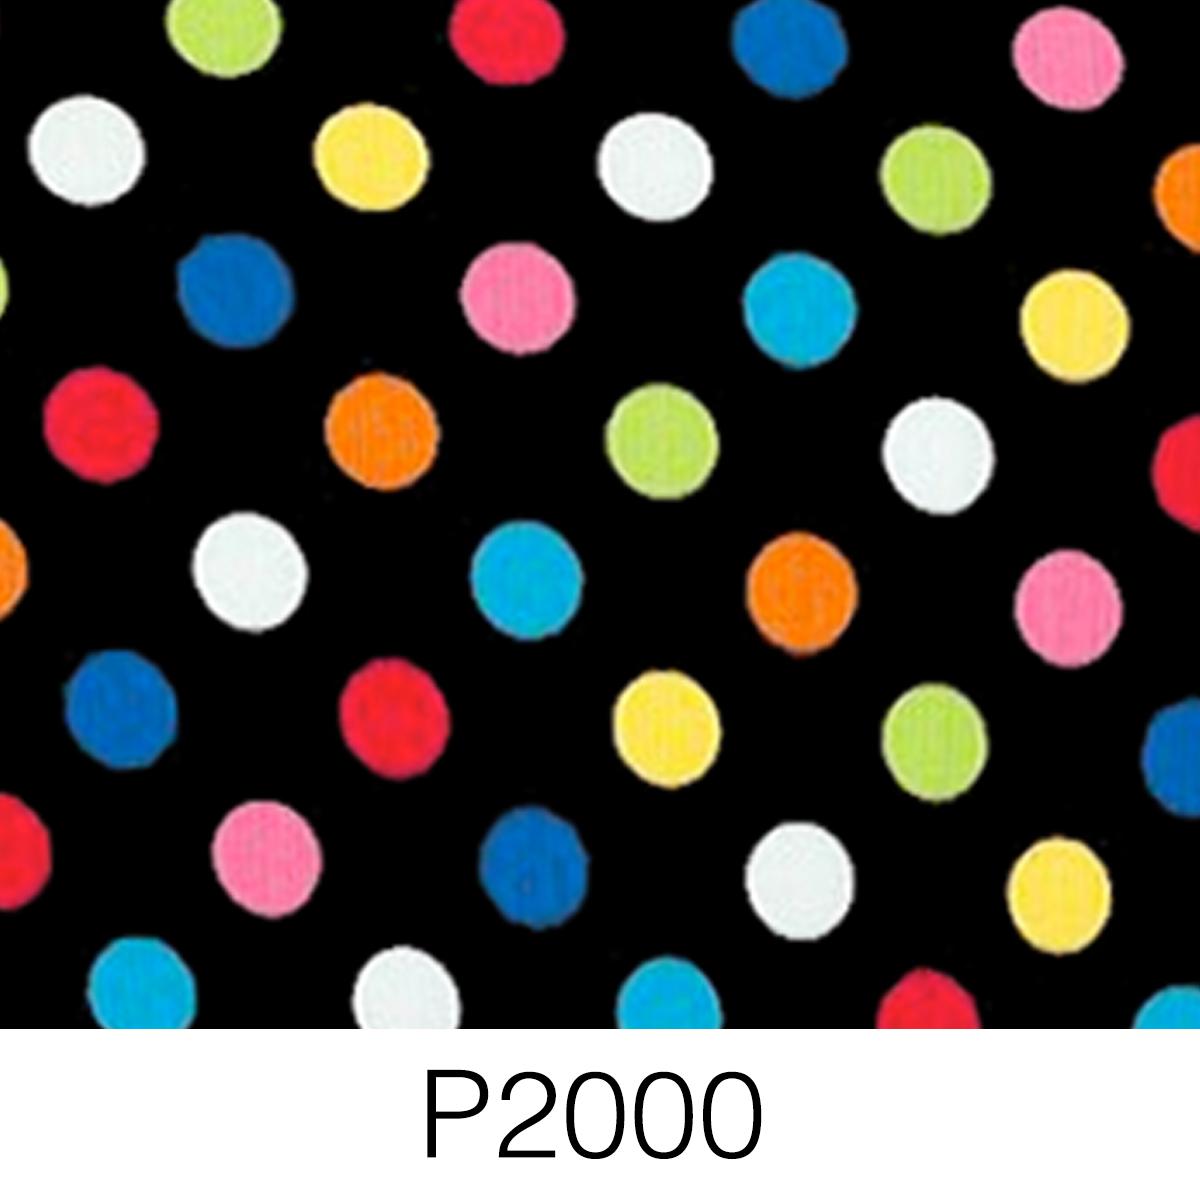 rainbow_dots.jpg